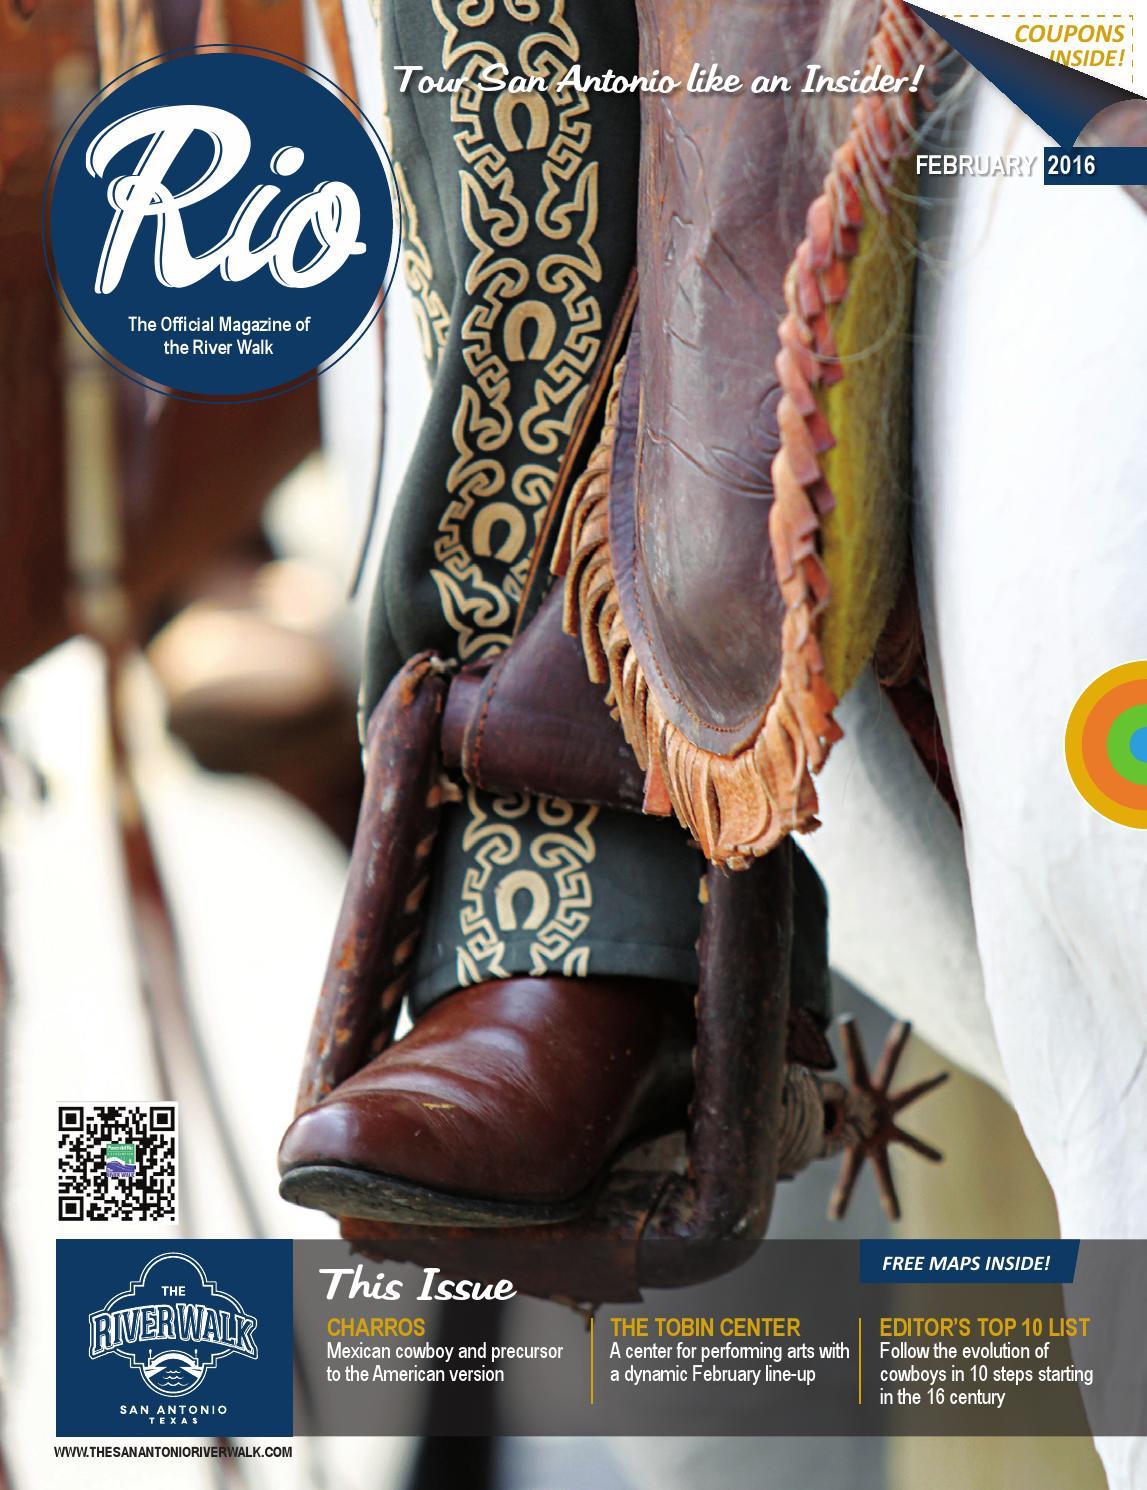 rio magazine february 2016 by traveling blender - issuu